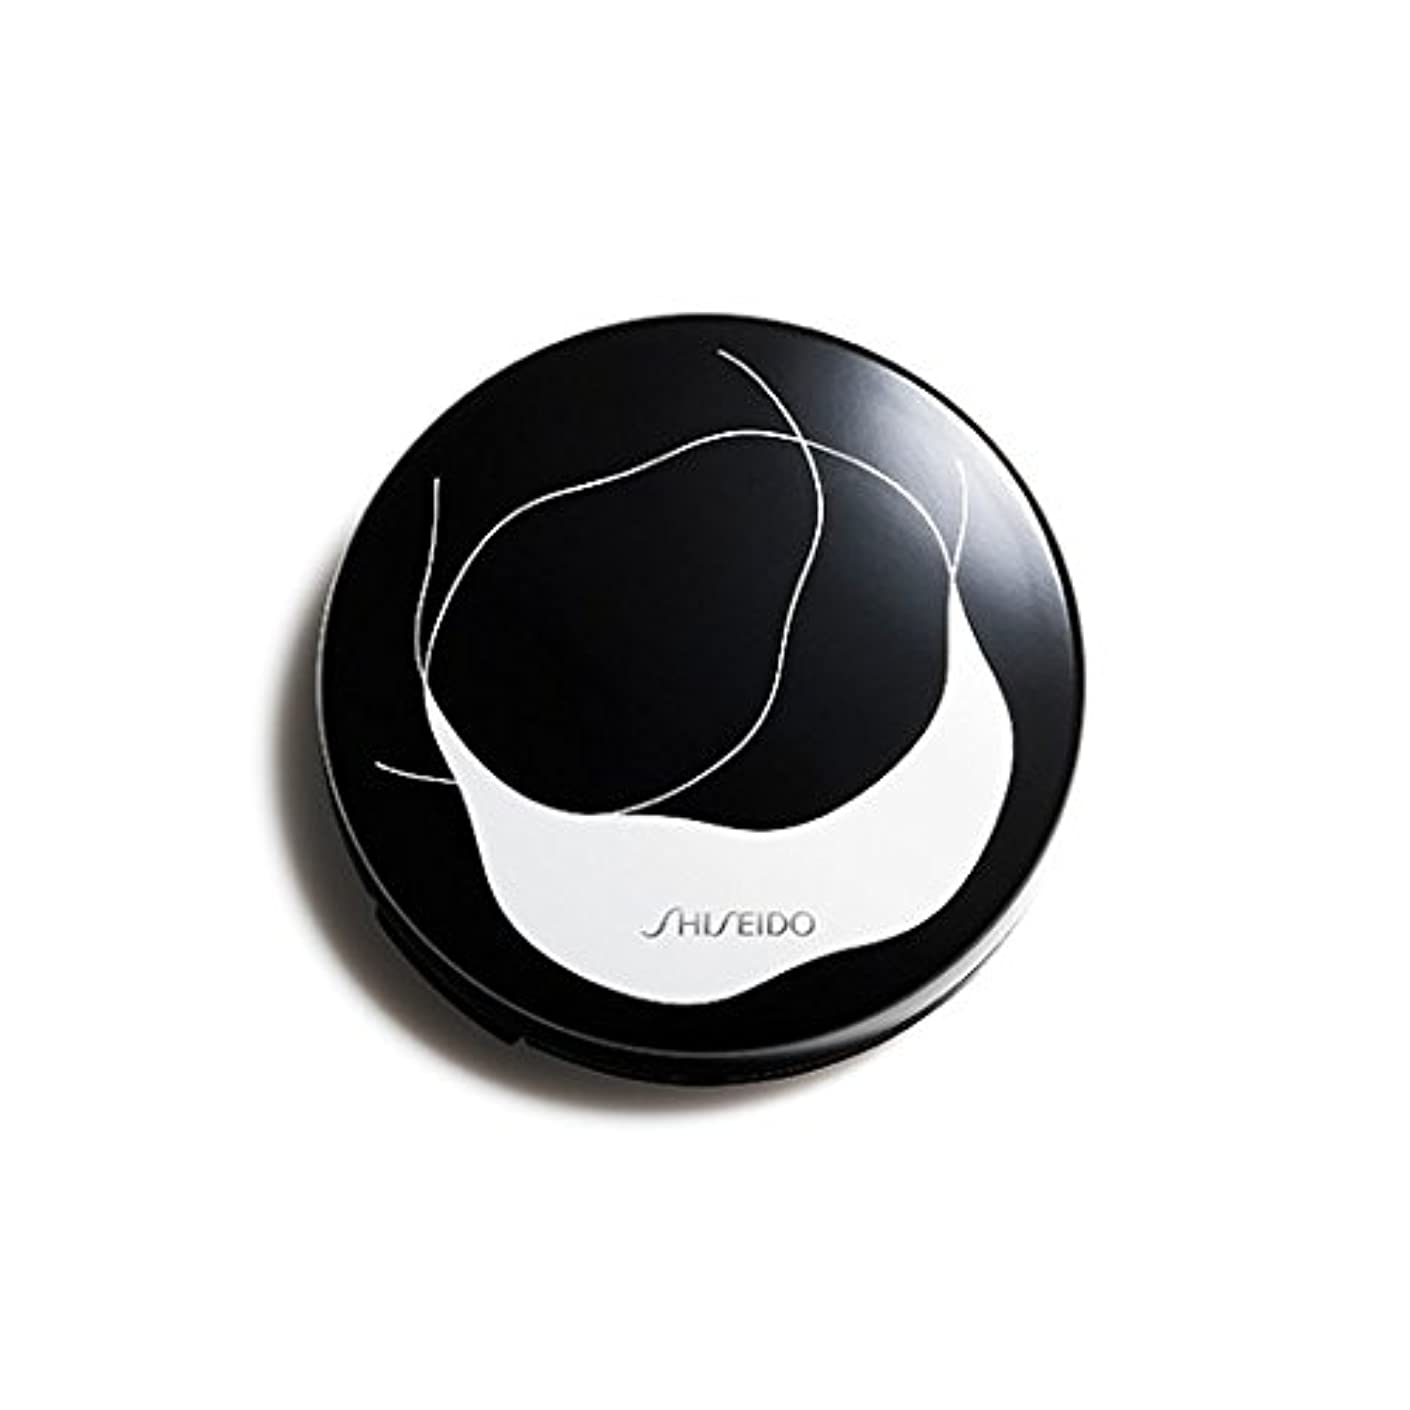 SHISEIDO 資生堂 シンクロスキン グロー クッションコンパクト ケース 国内正規品